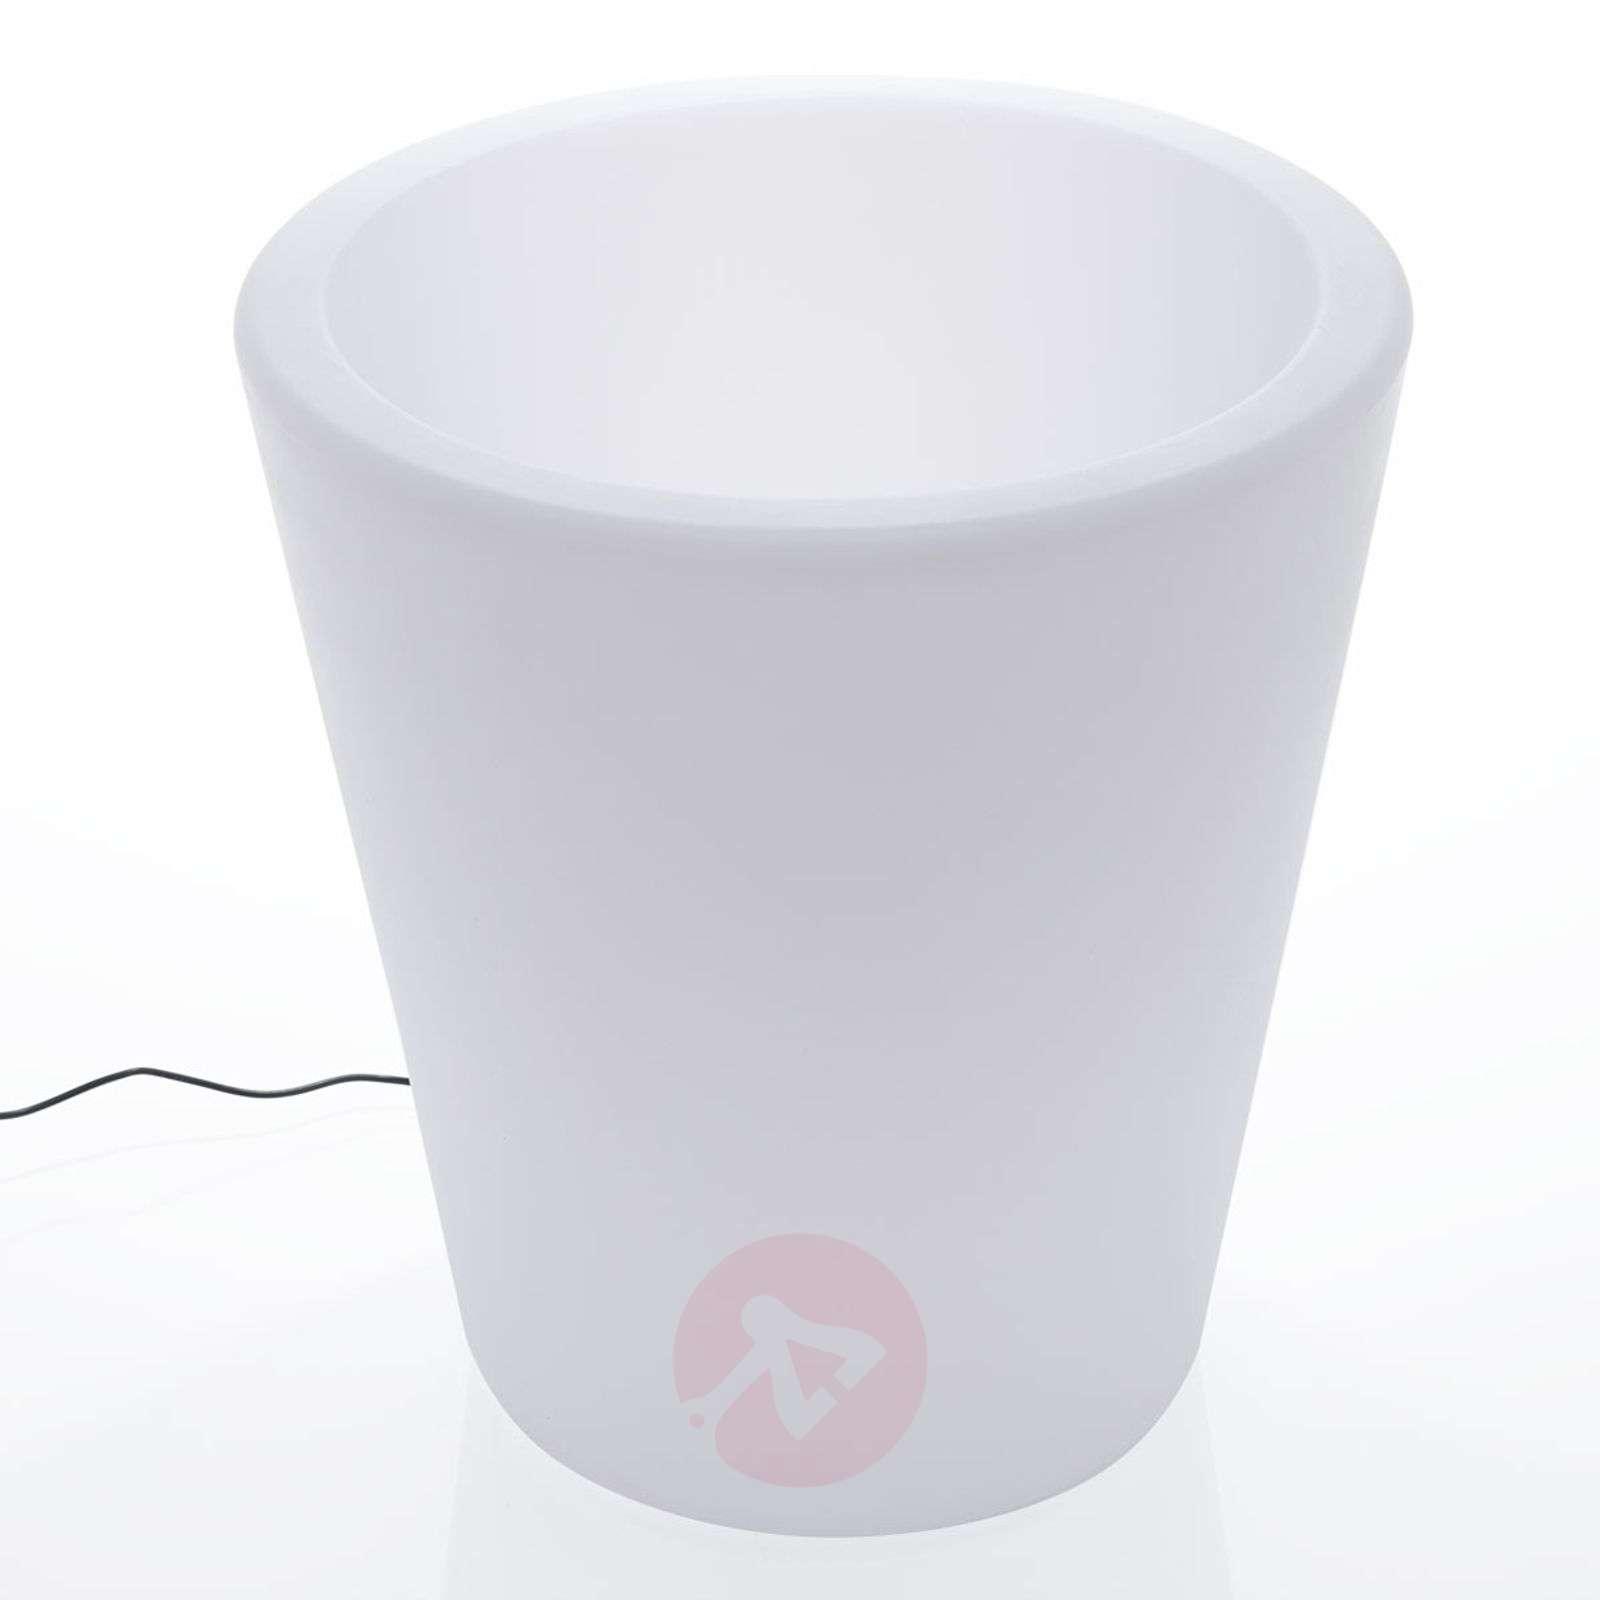 LED flowerpot light Leyra, RGB, remote control-6729016-01